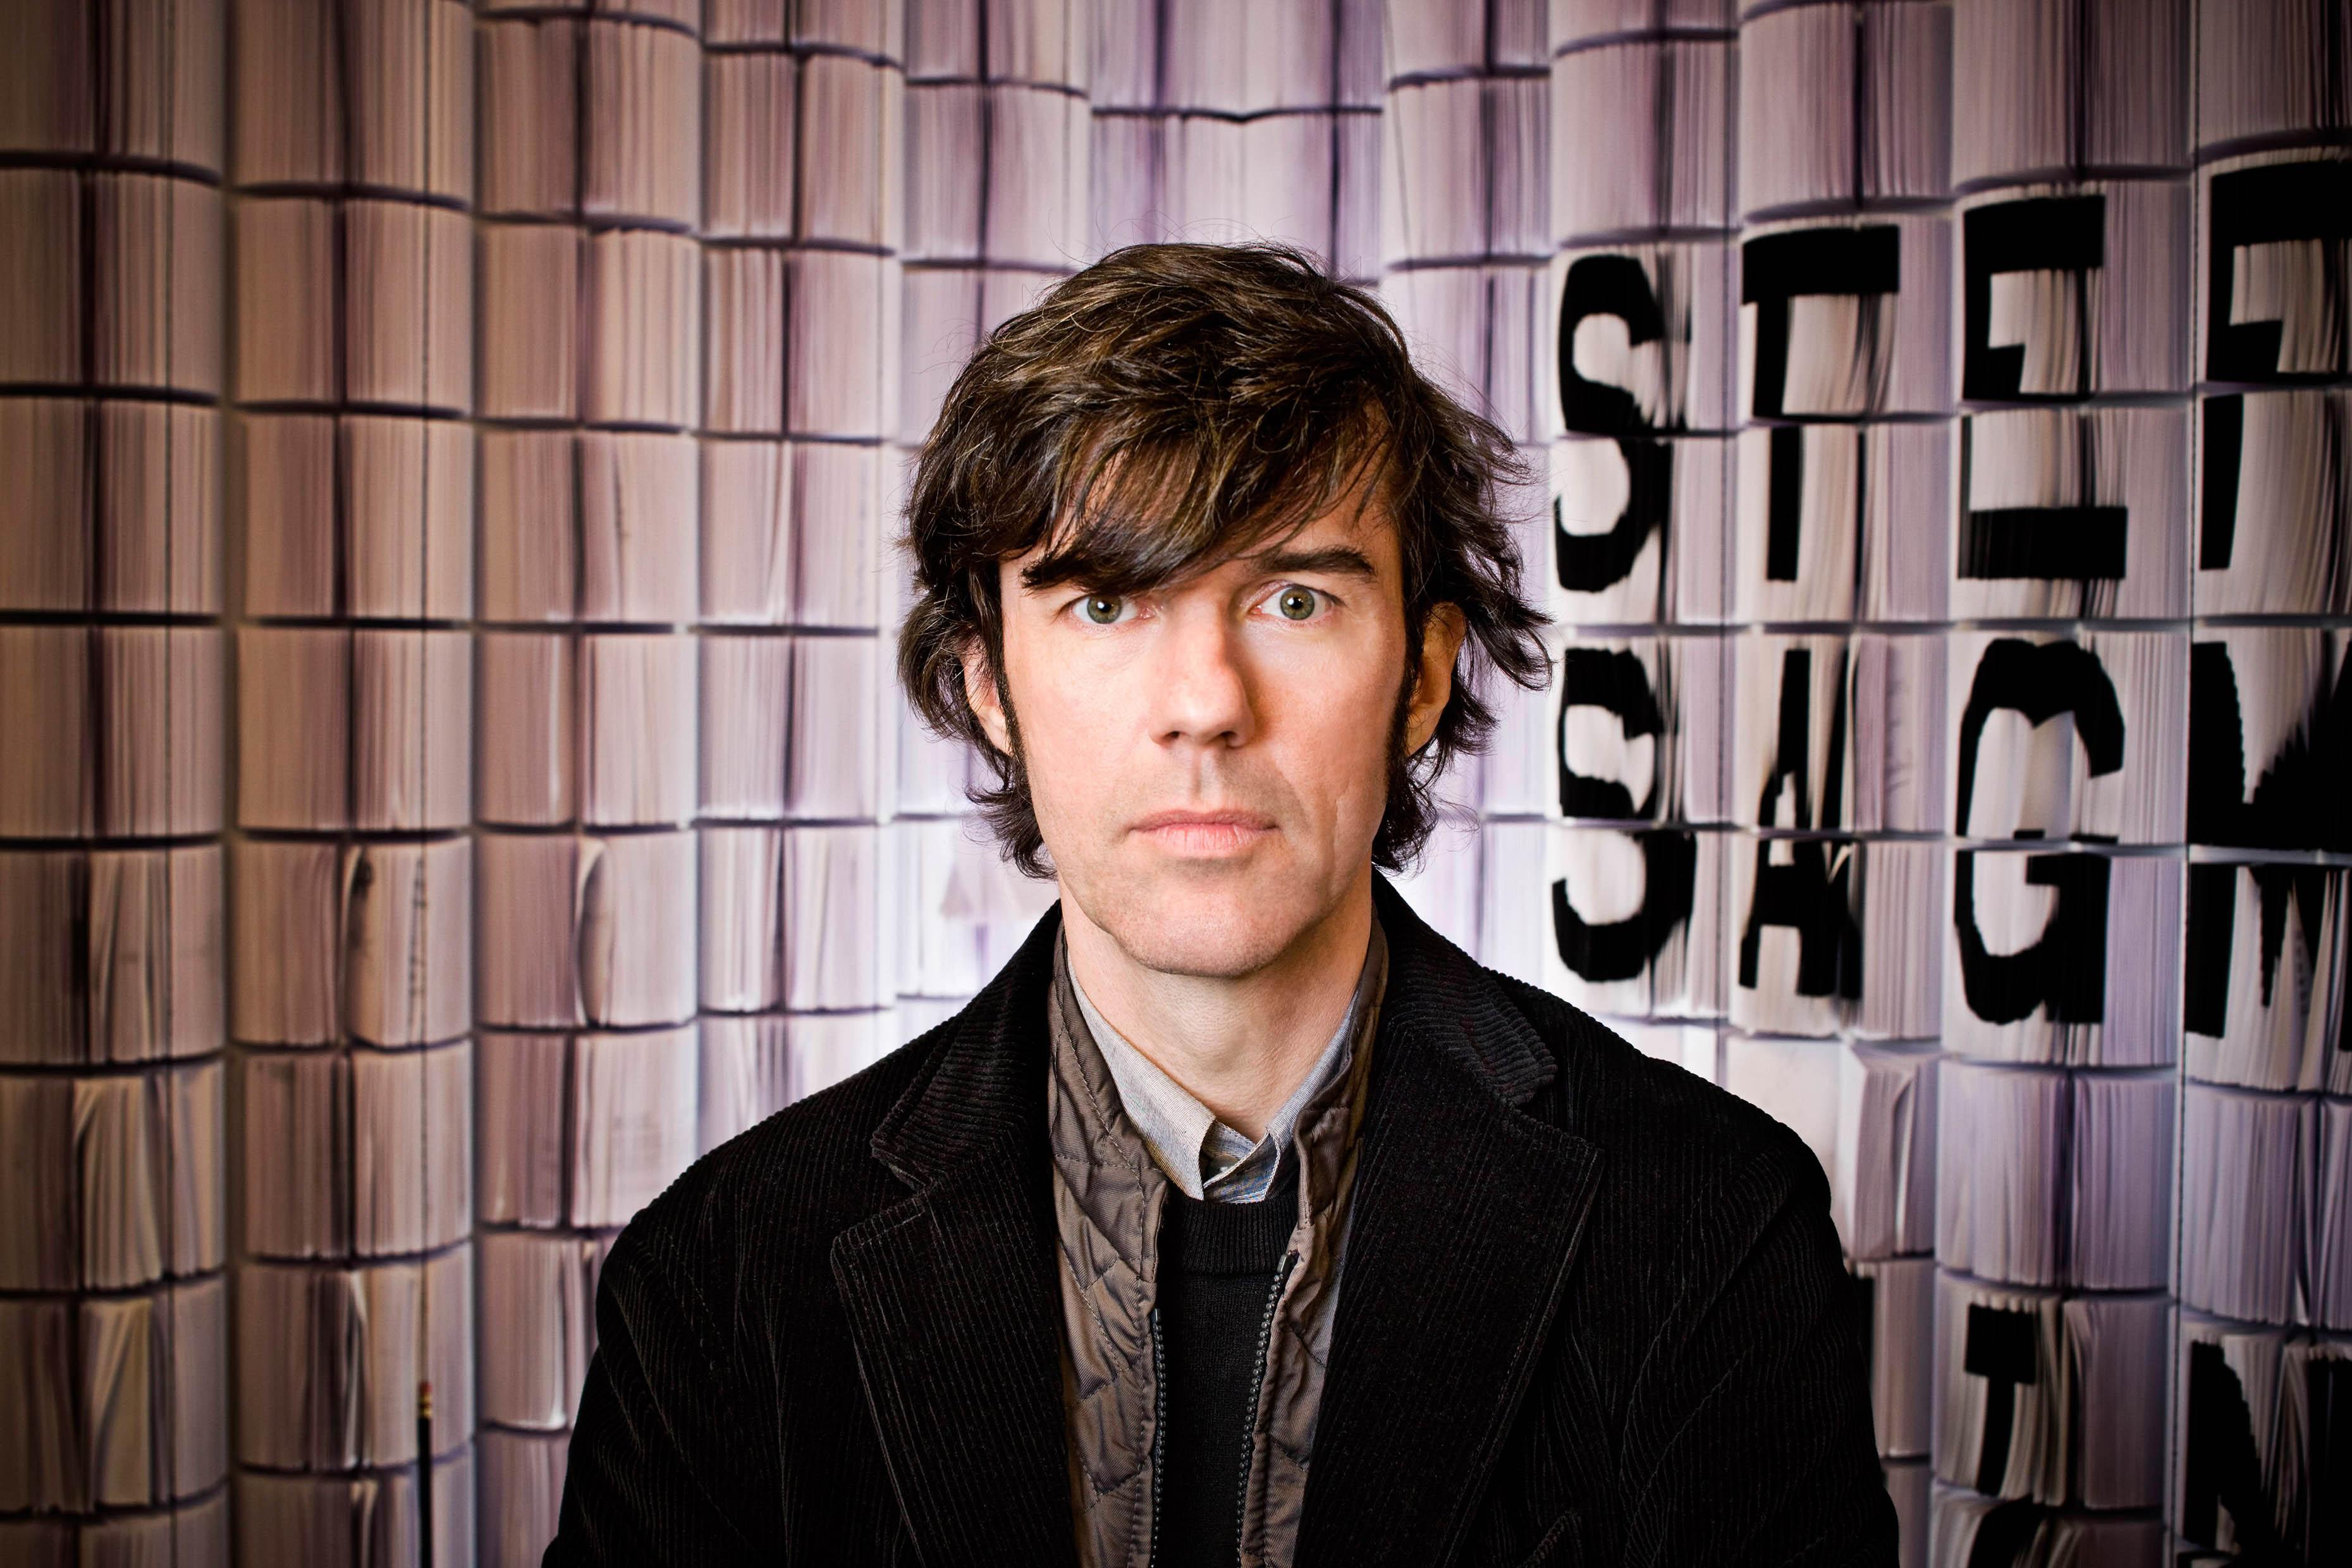 Stefan Sagmeister Foto: Sagmeister & Walsh